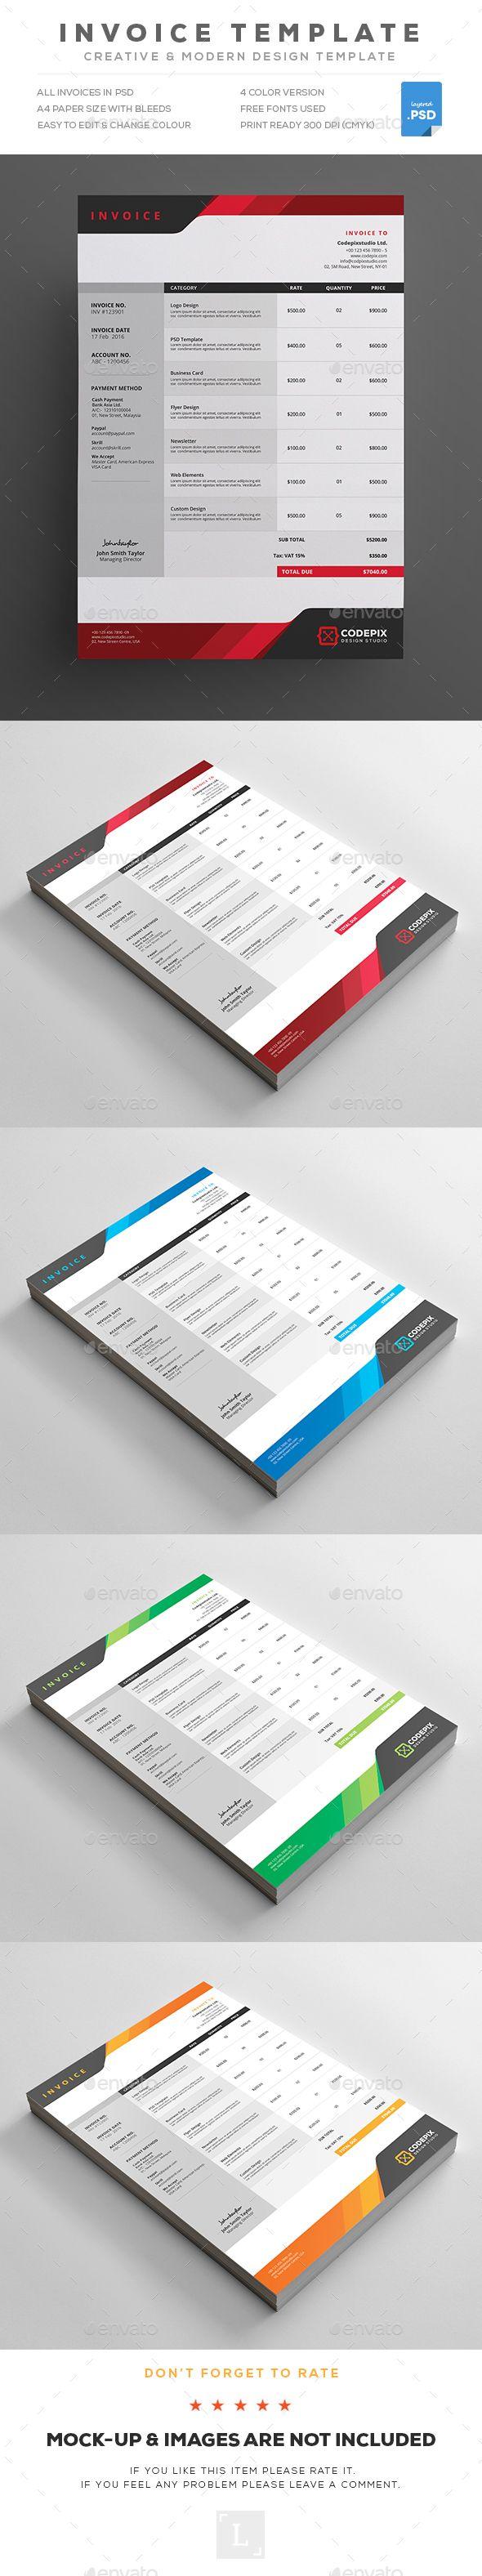 Invoice Invoice TemplateCompany Letterhead 1262 best